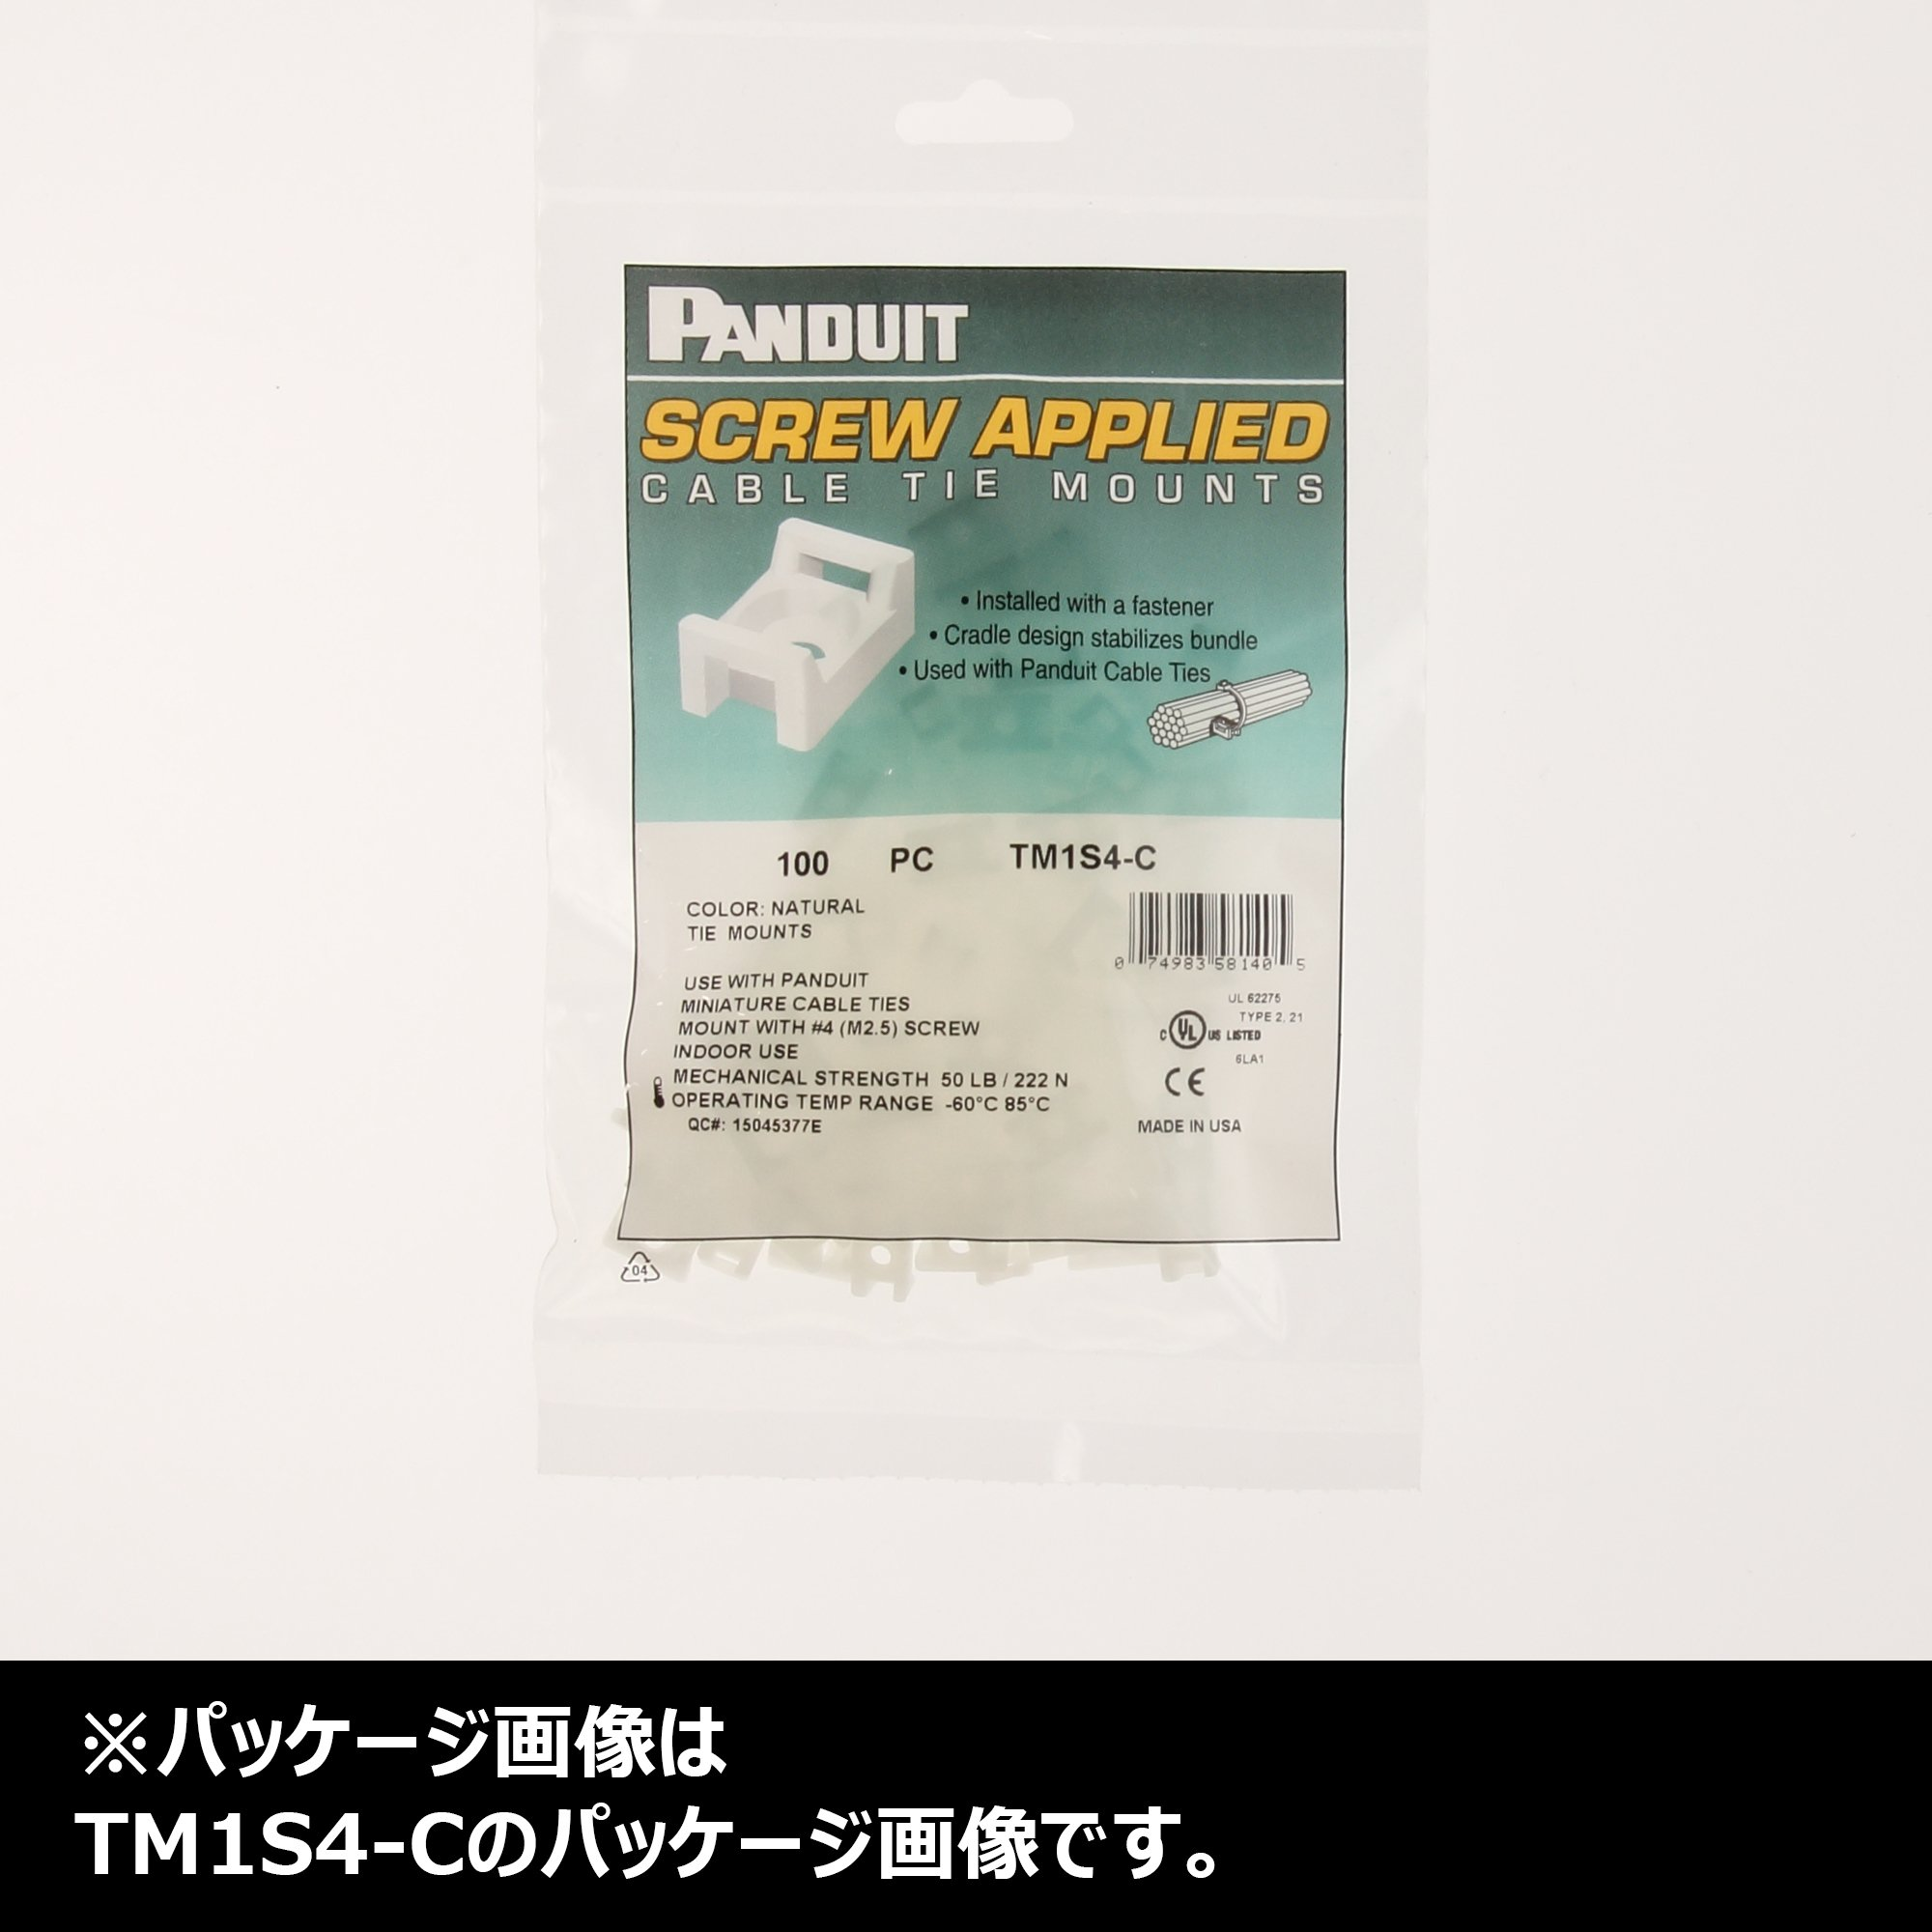 Panduit TM2S8-C .43'' Width Cable Tie Mount - #8 Screw - Natural - 100 Pack by Panduit (Image #3)